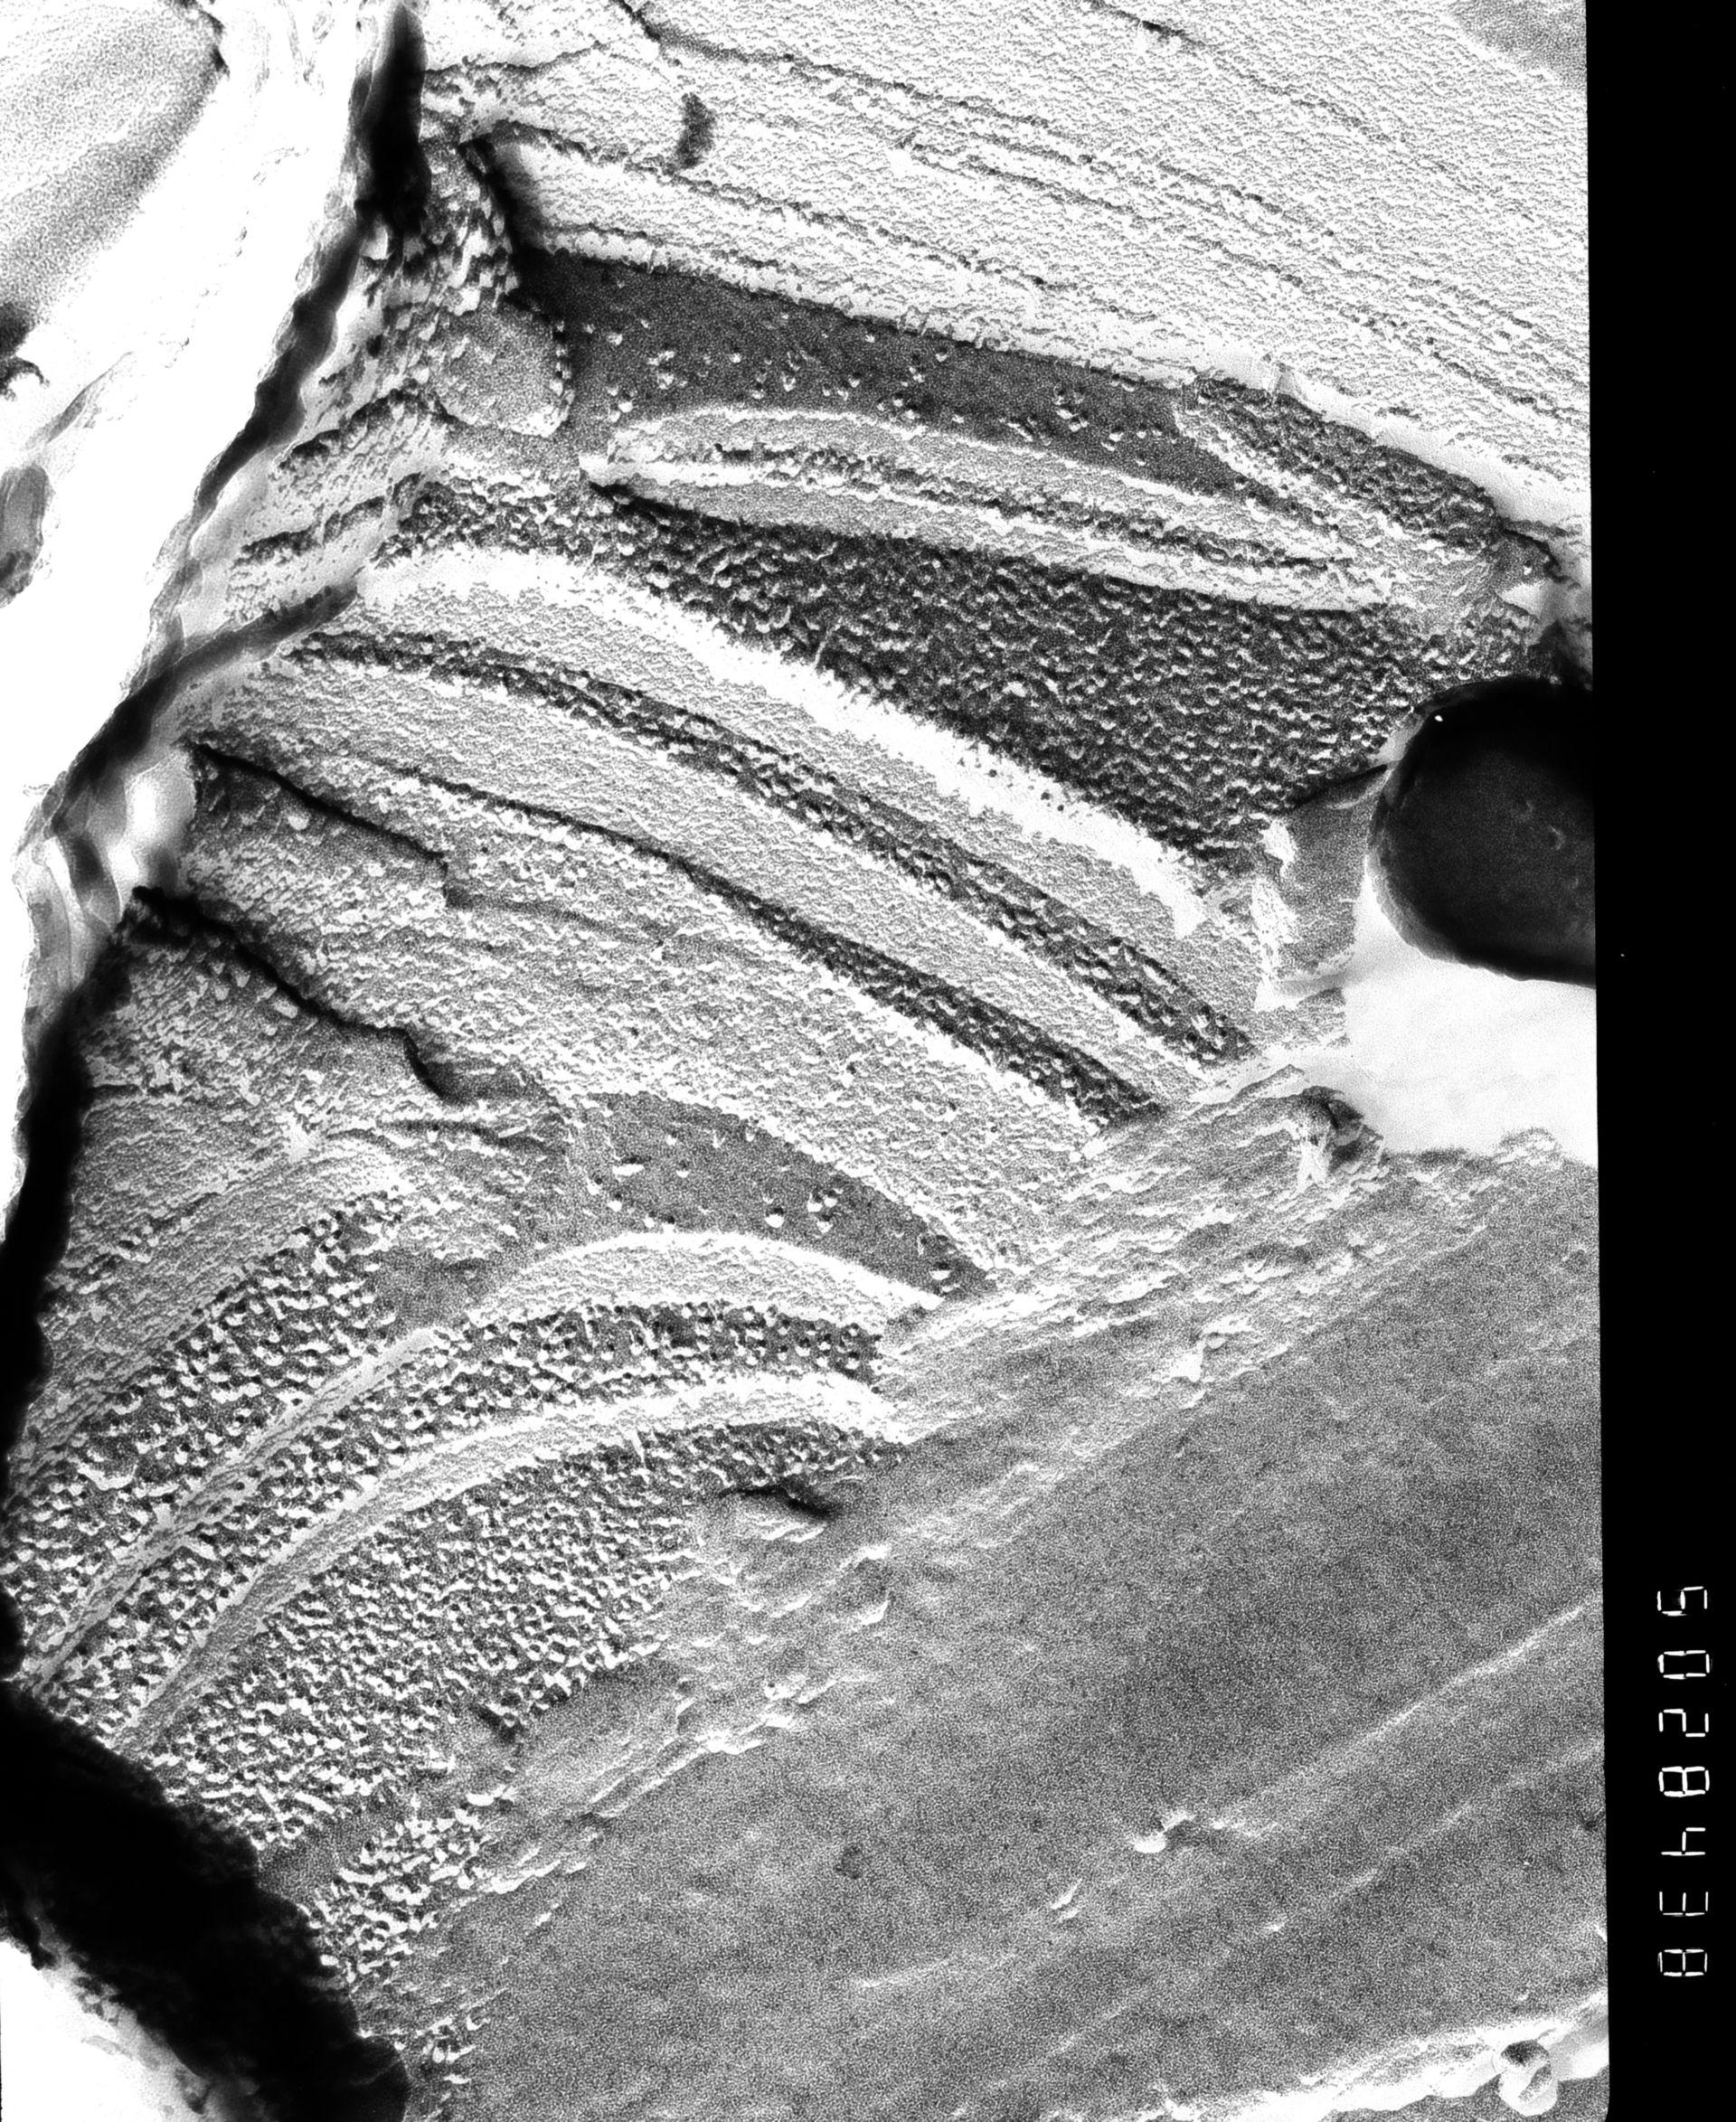 Prochloron (Thylakoid) - CIL:16229